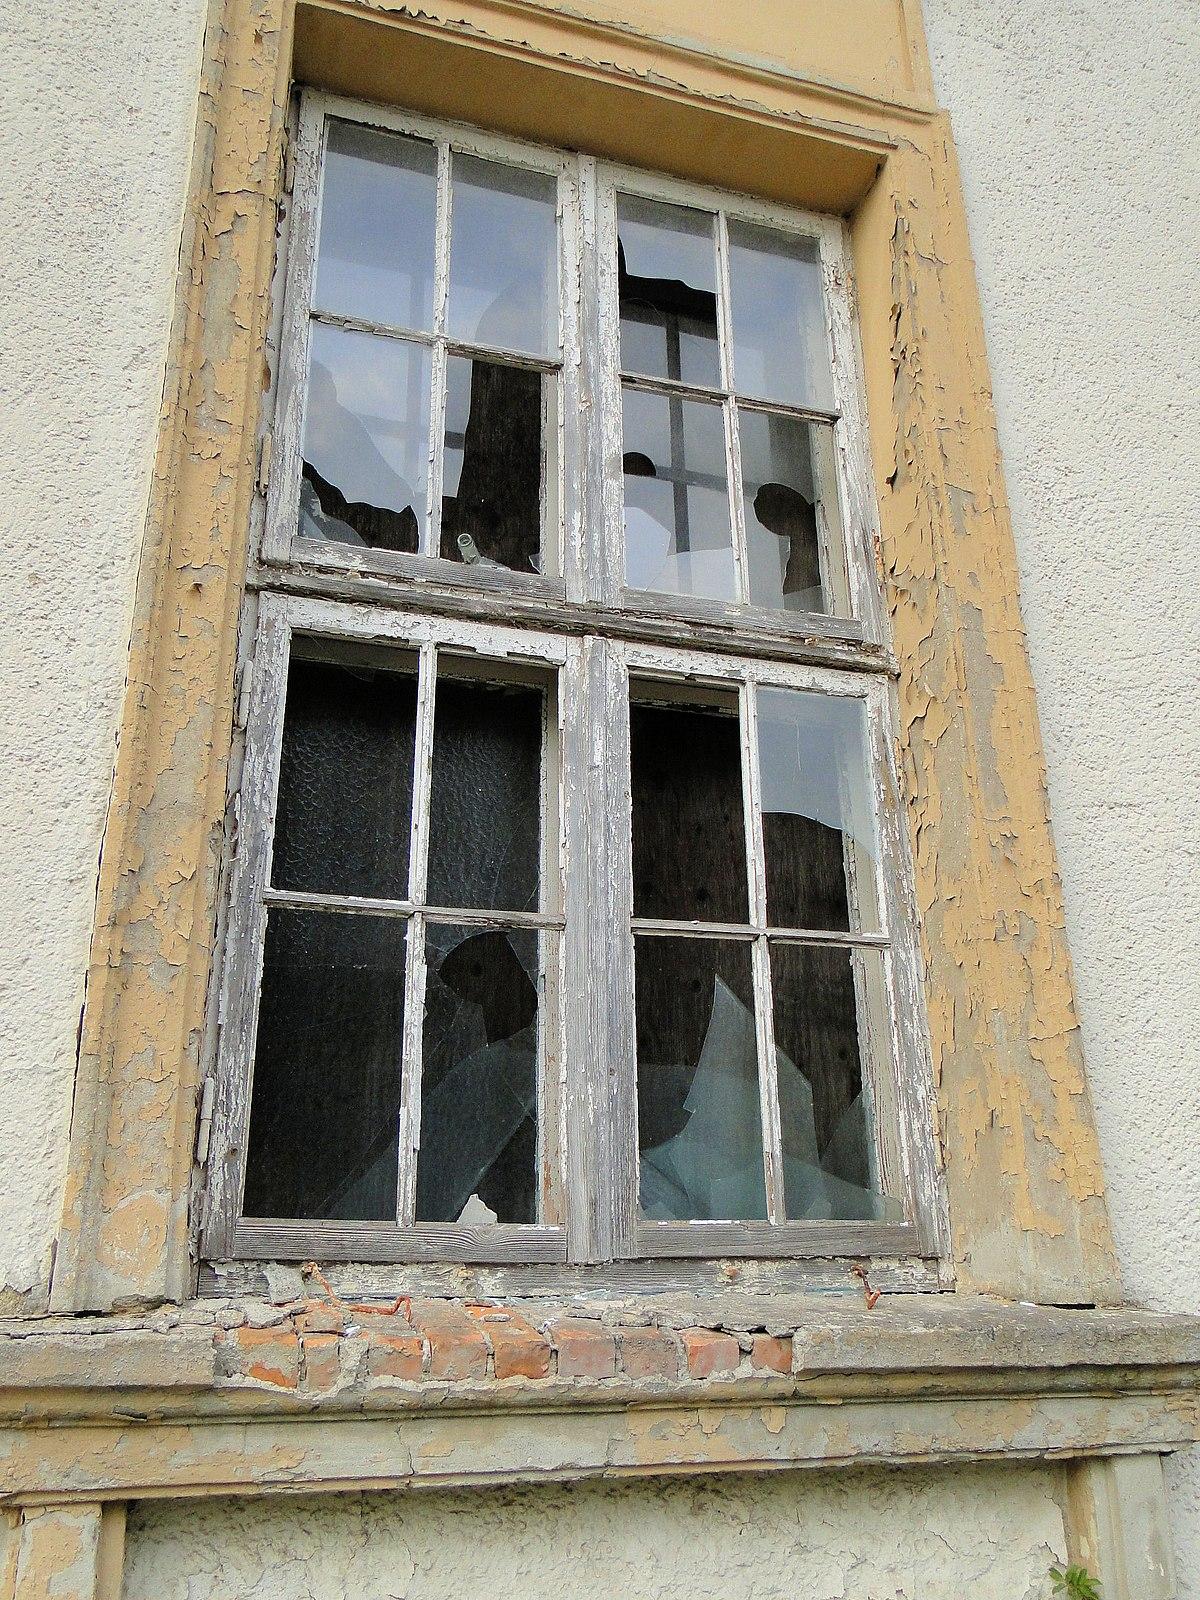 Broken windows theorie wikipedia for Fenster englisch